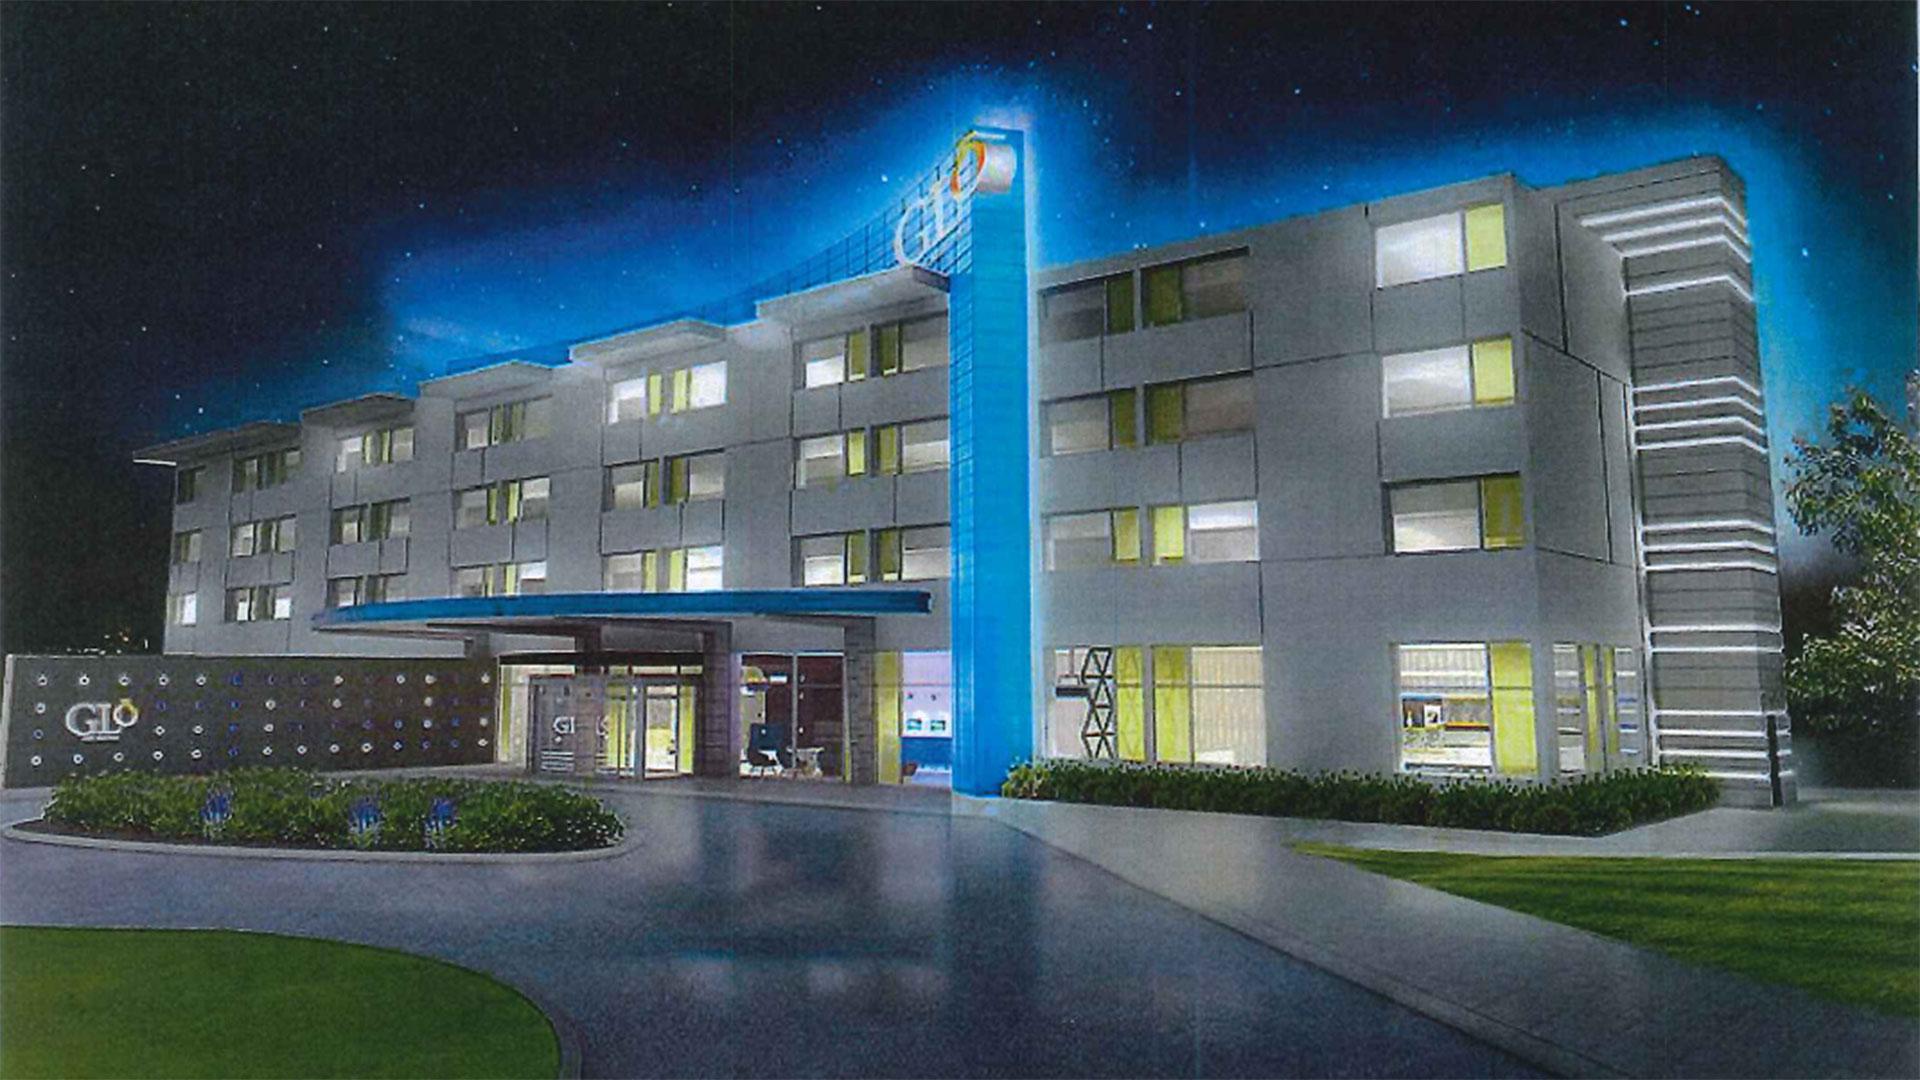 KELO GLo hotel Sioux Falls design